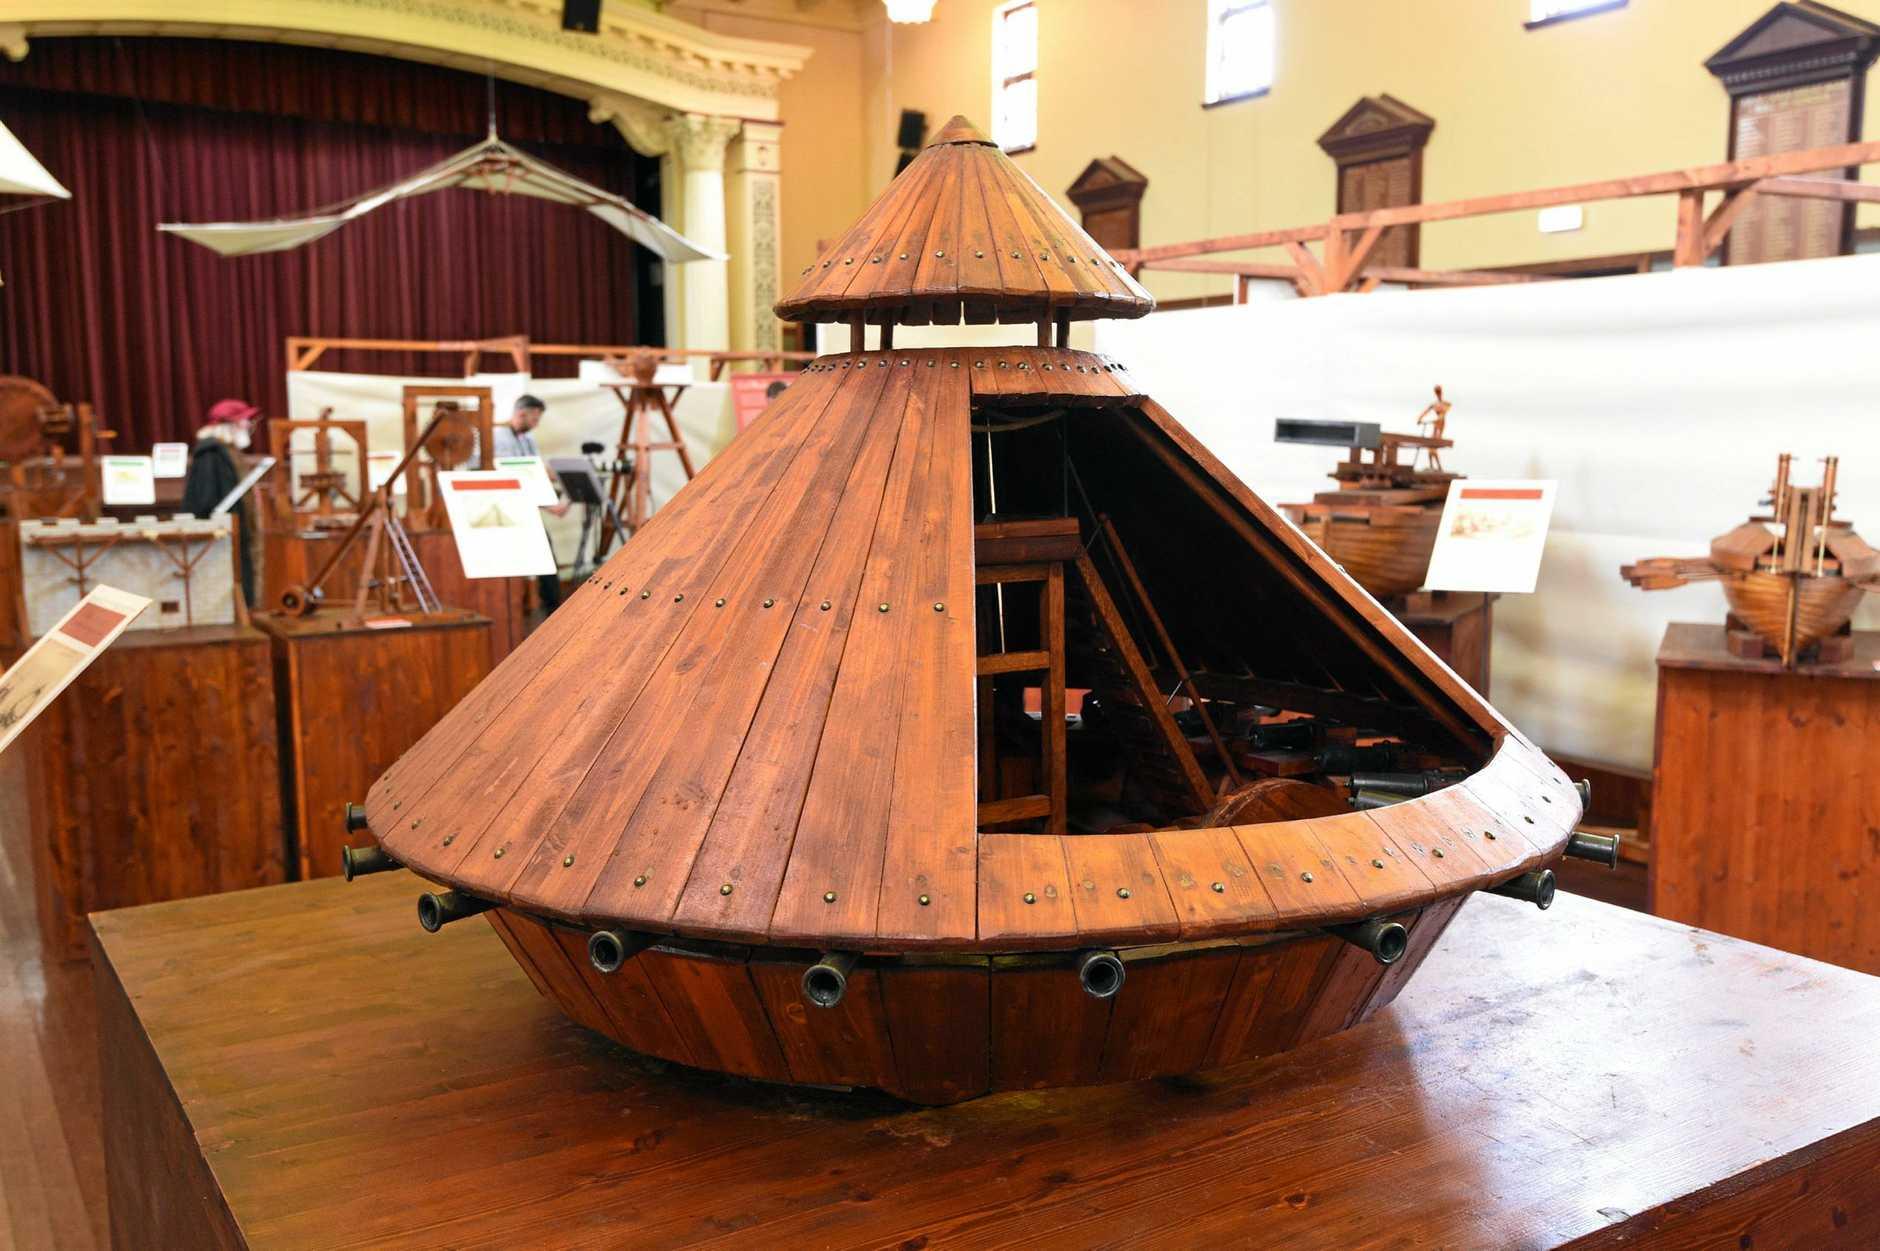 Da Vinci Machines exhibition at the Maryborough City Hall.